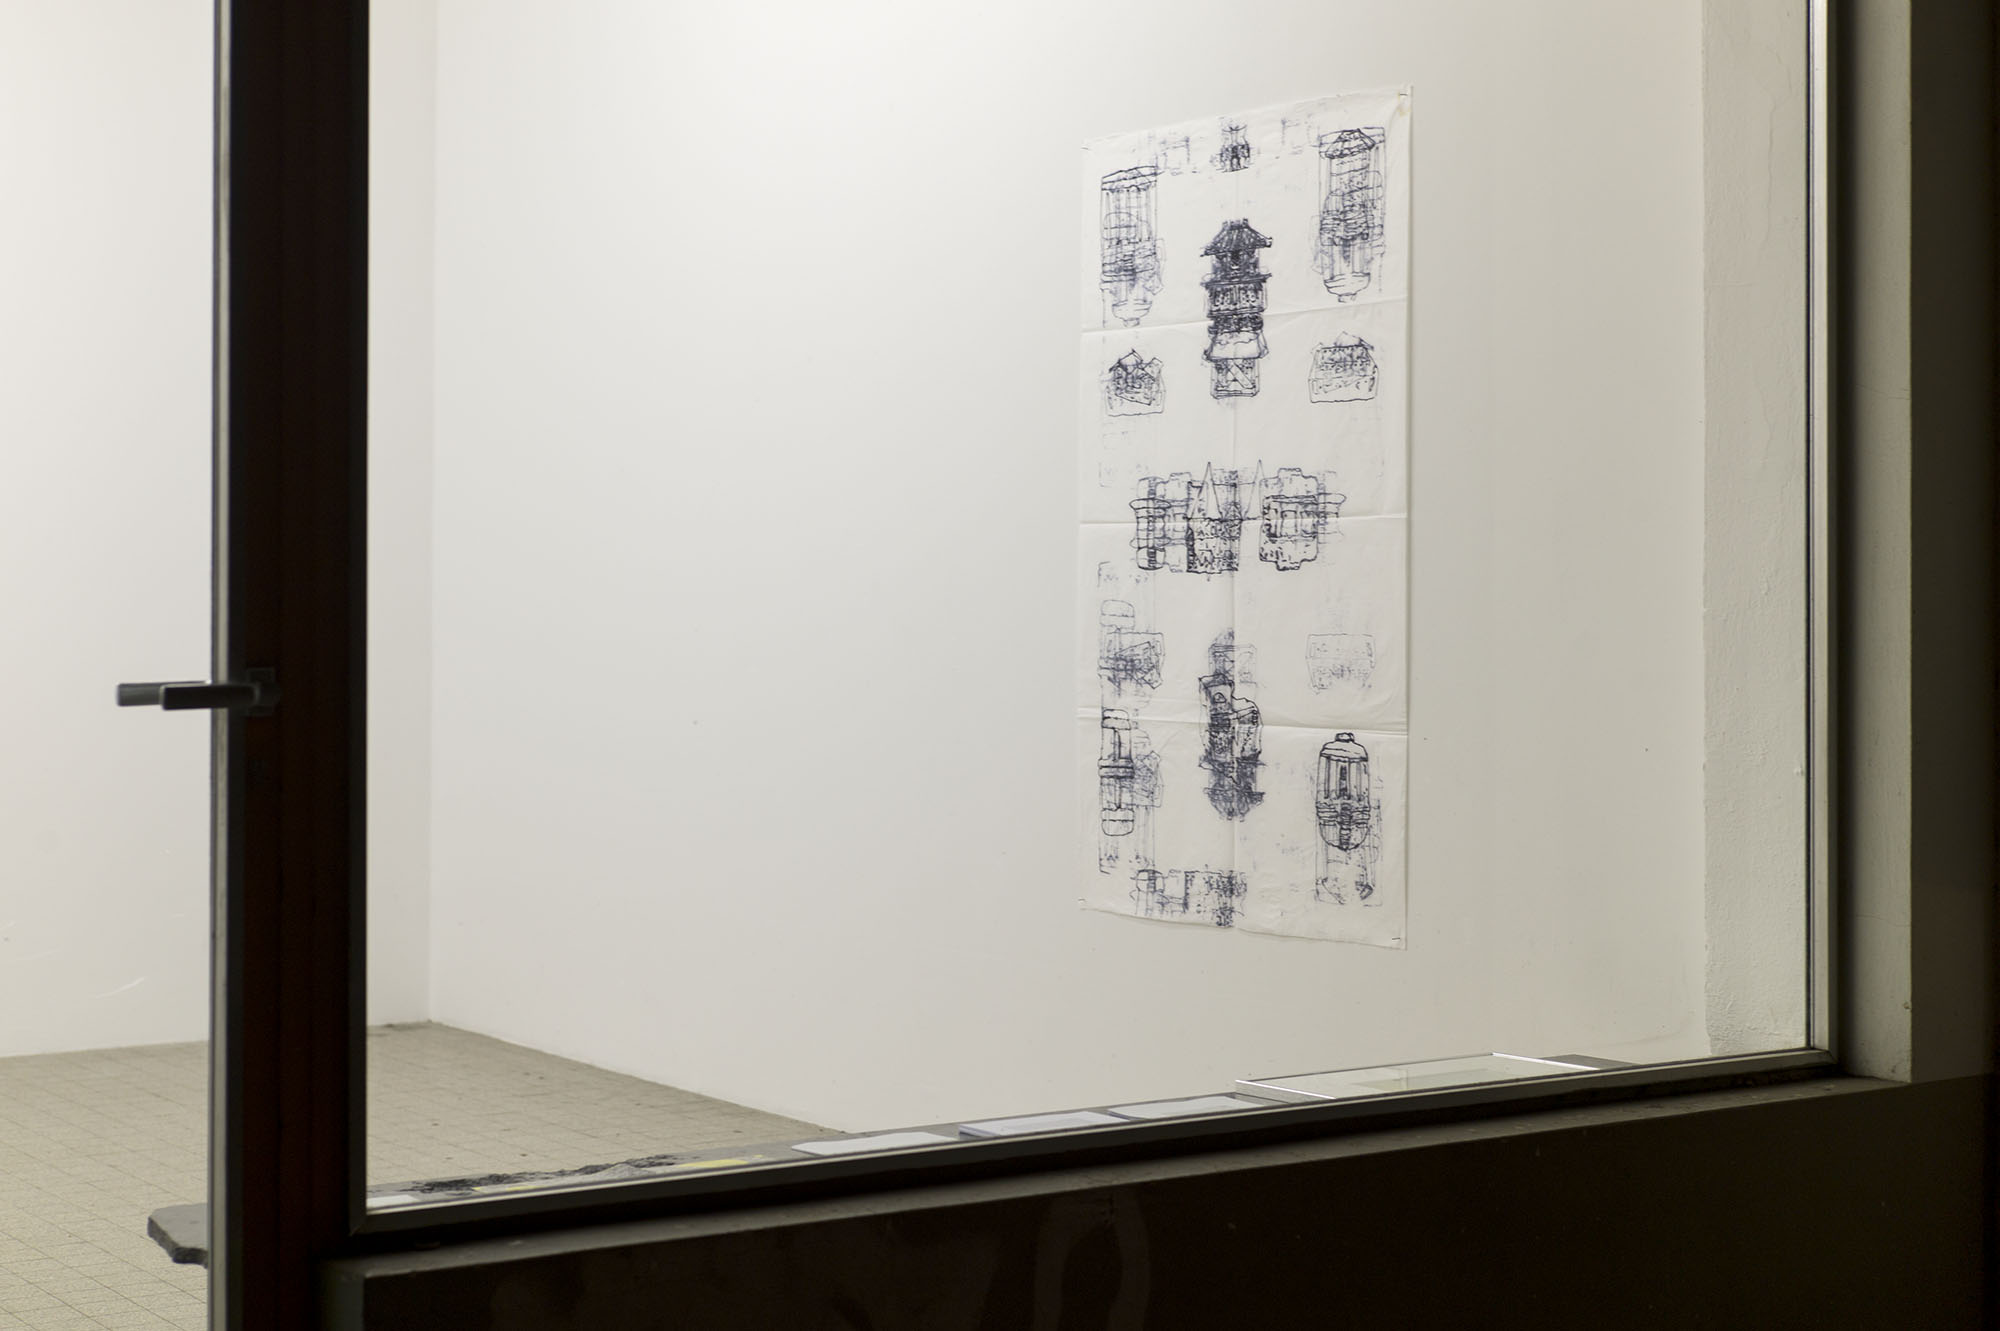 Martin Widmer, Lupo Borgonovo, WHOOSHH, Gallery Truth and Conseq